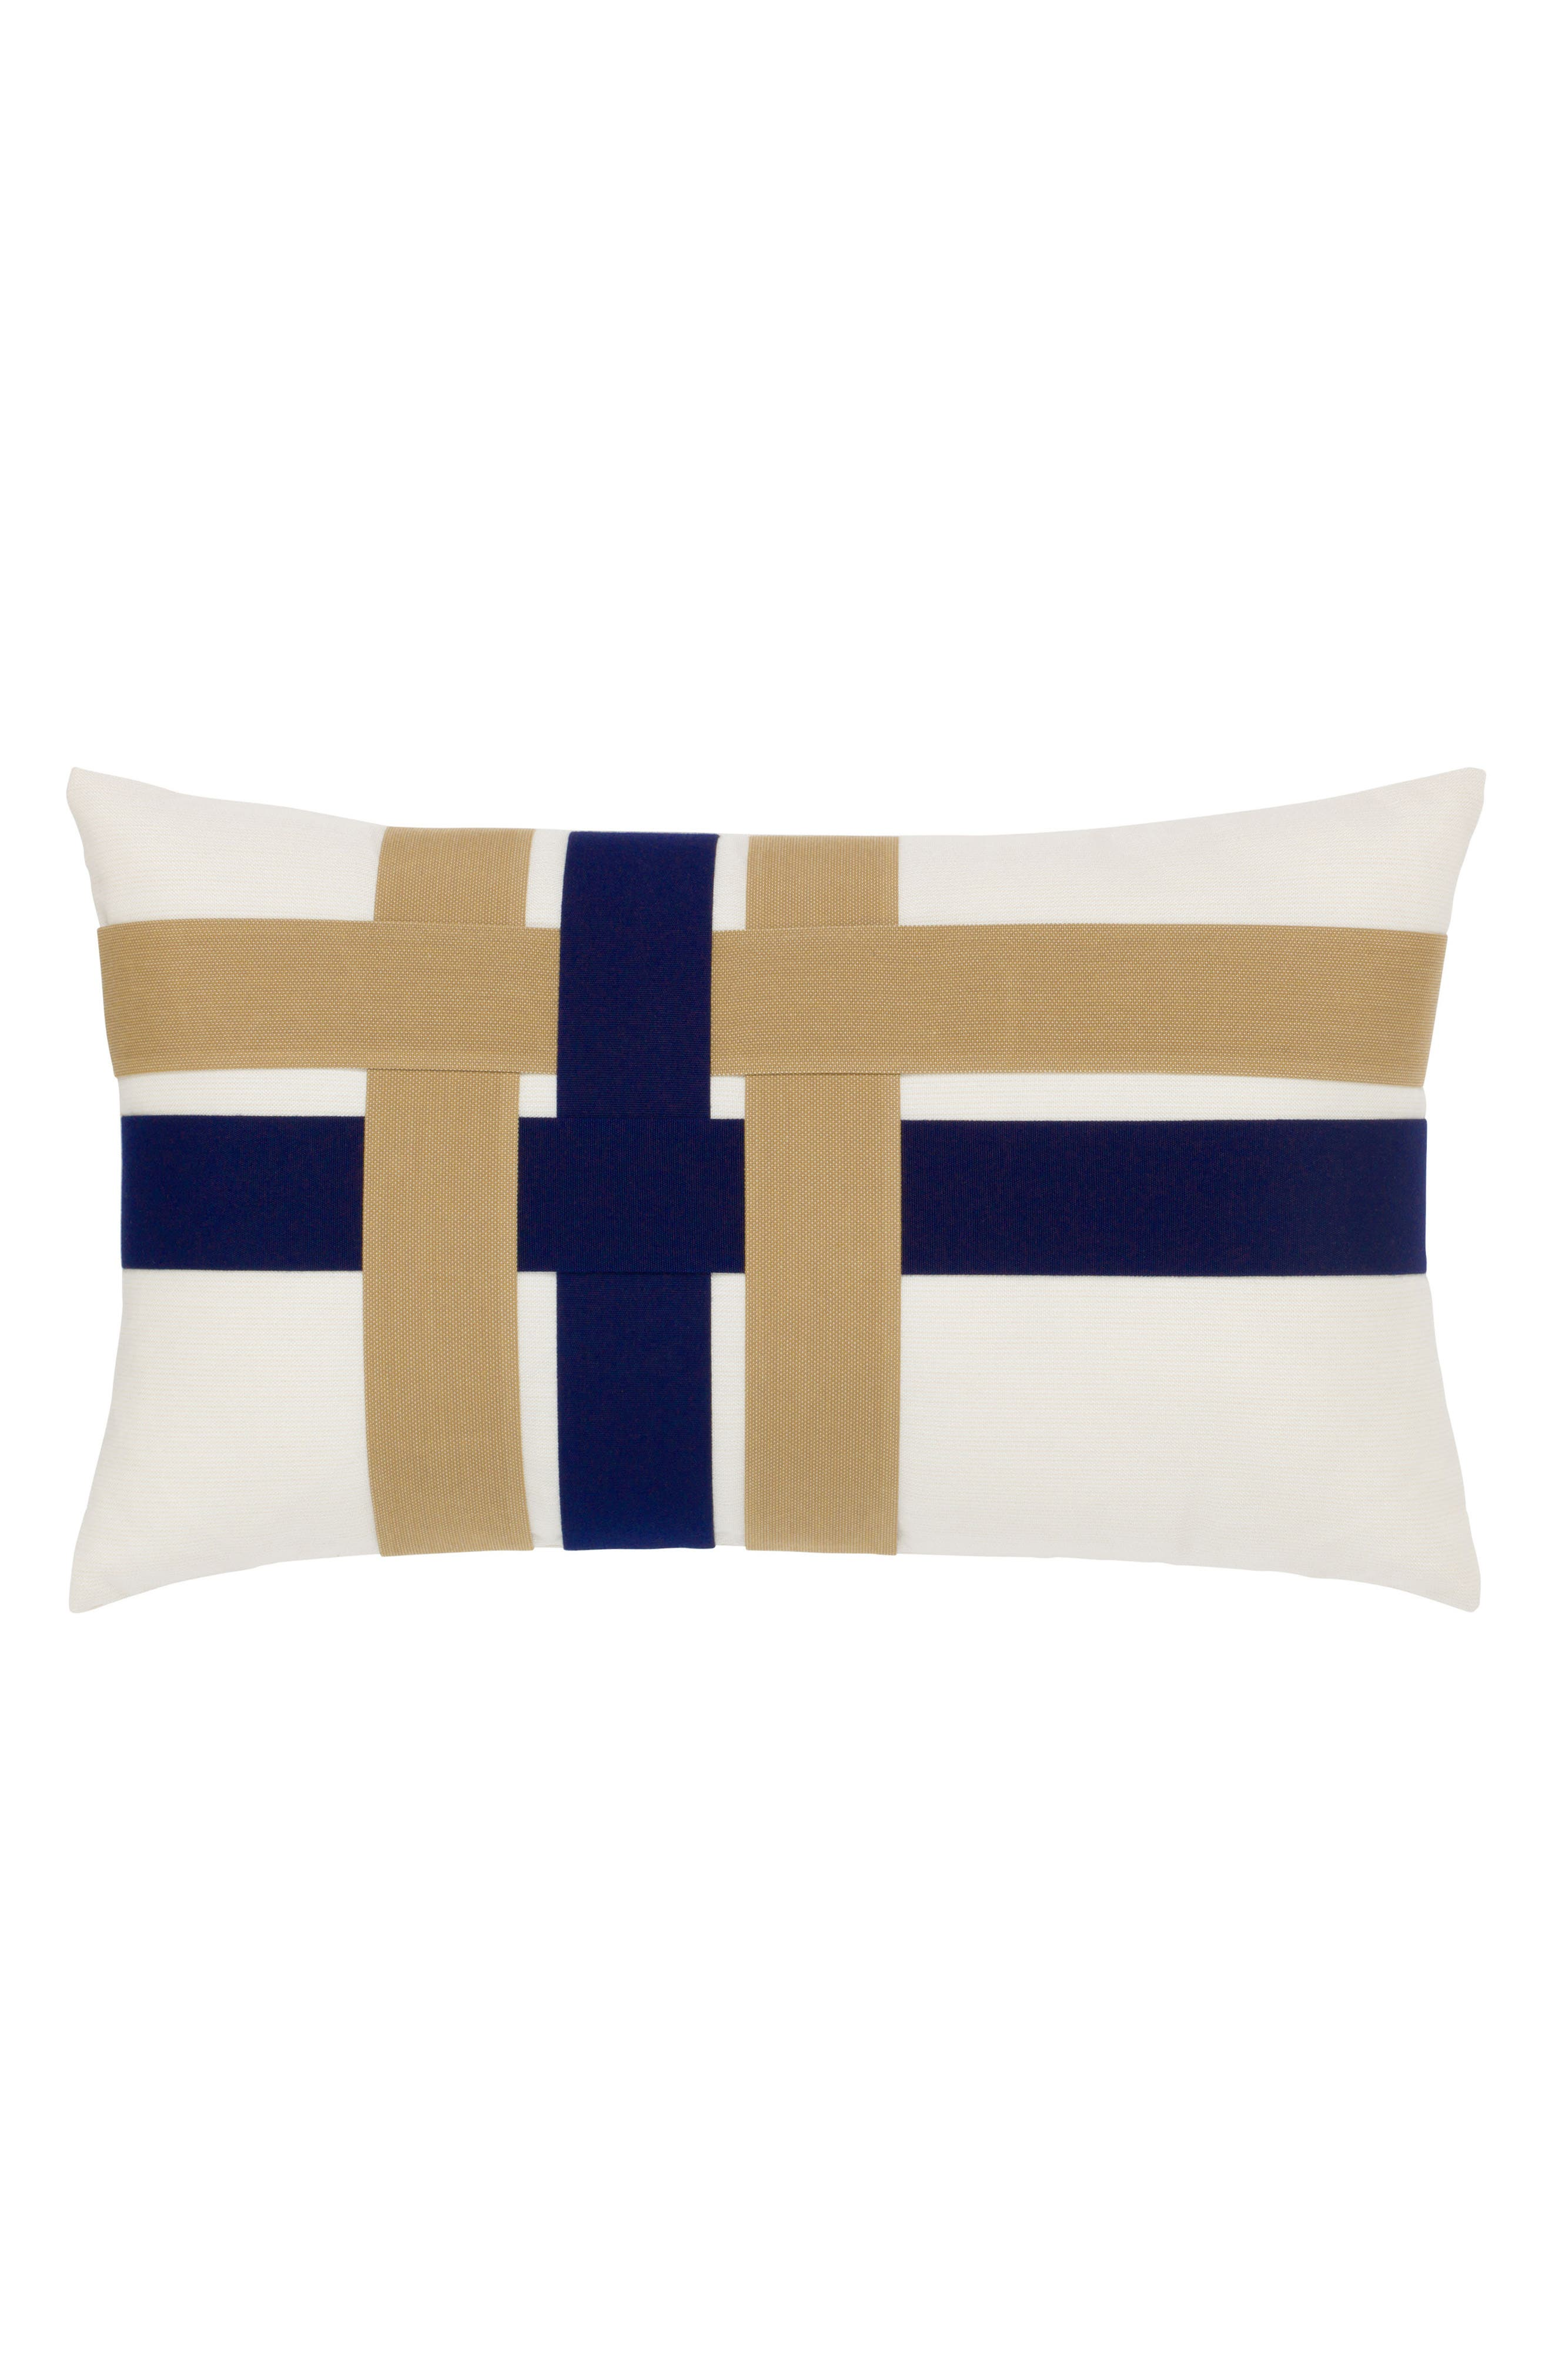 Woven Shimmer Lumbar Pillow,                         Main,                         color, BLUE/ WHITE